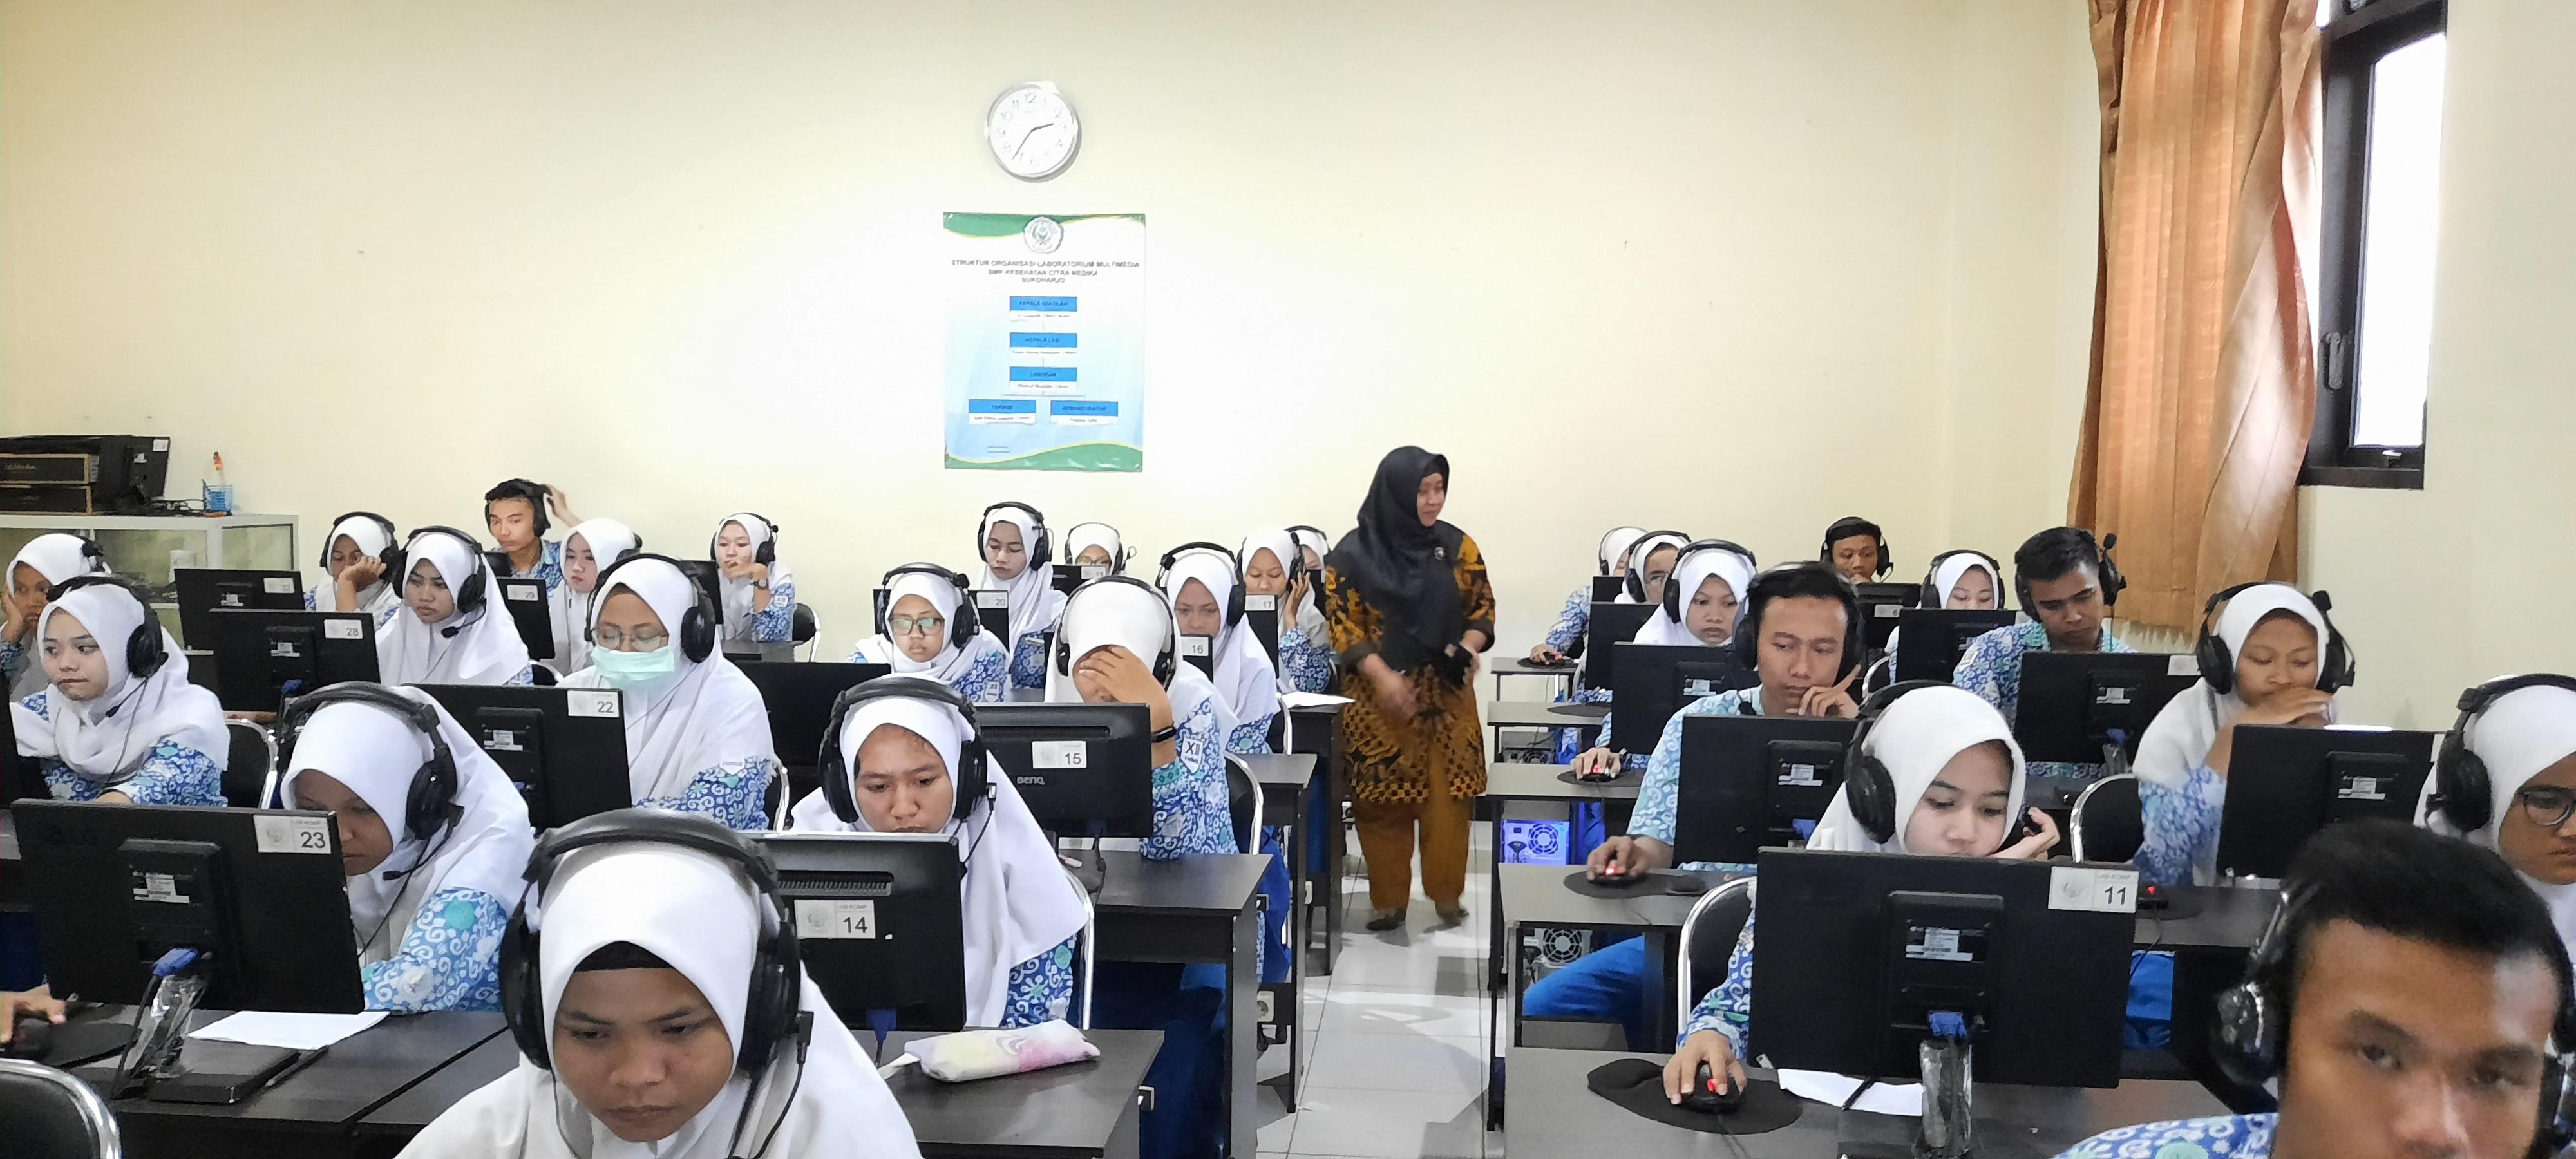 Meningkatkan Kompetensinya, Citra Medika Sukoharjo Gandeng Language Training Centre (LTC) UDB mengadakan test TOEIC